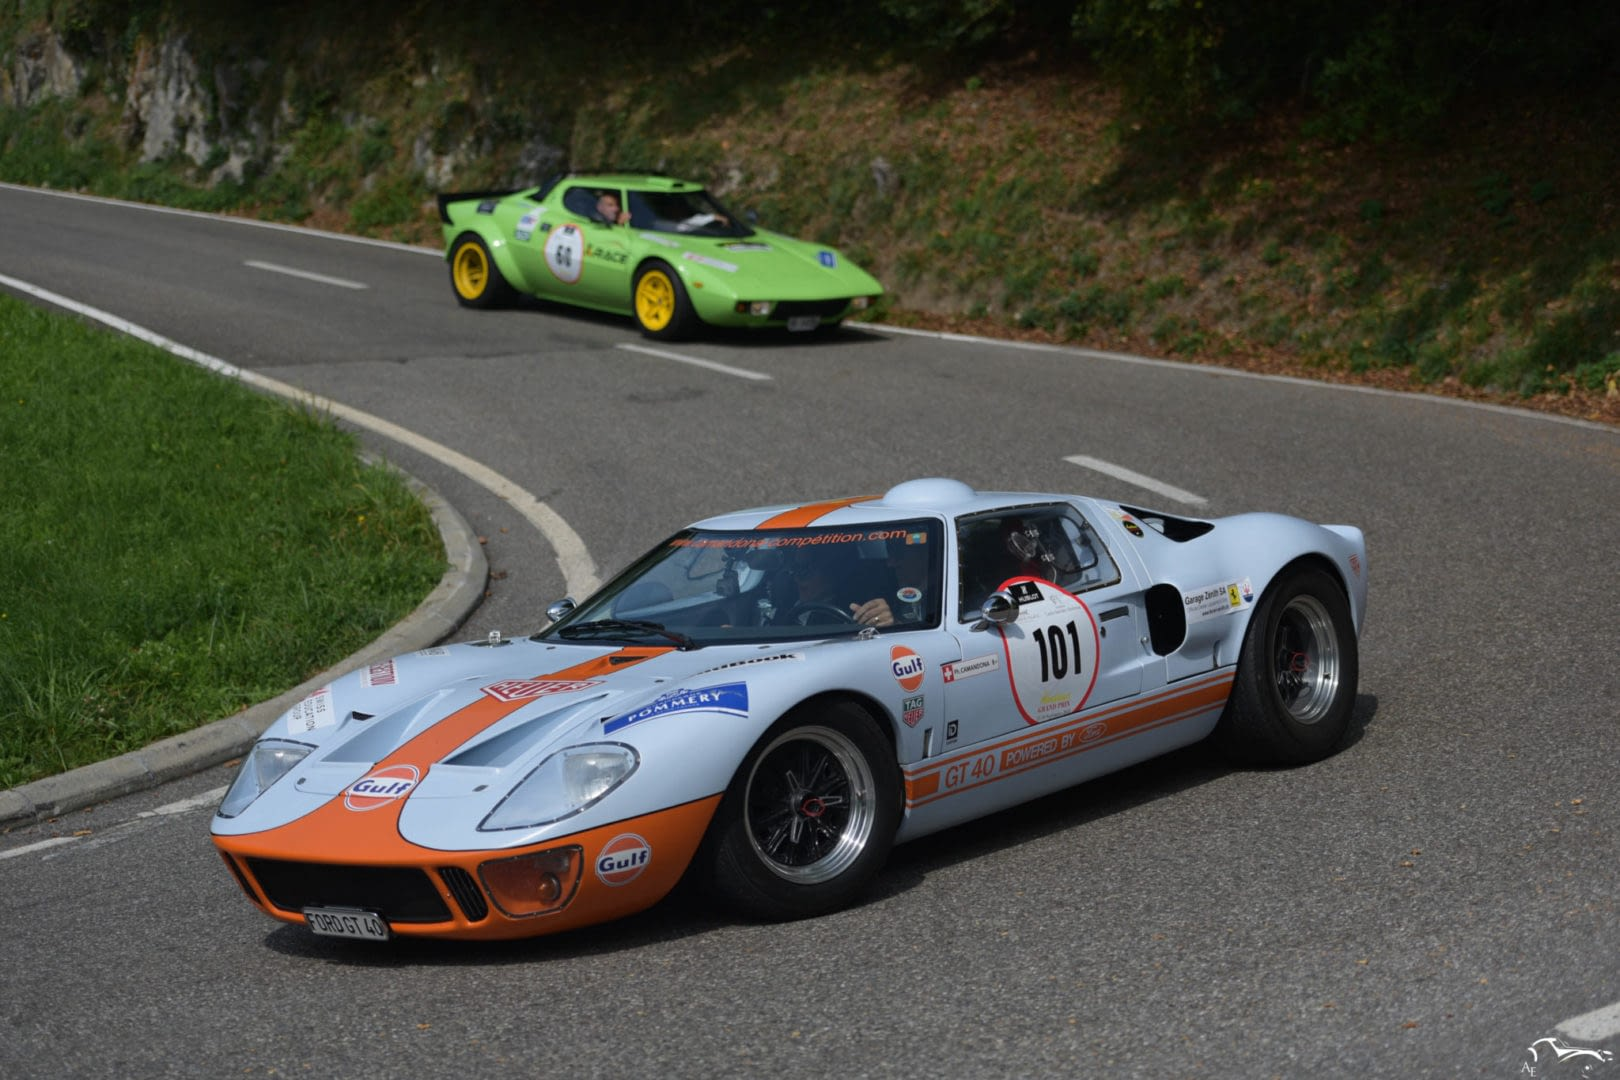 Ford GT40 & Lancia Stratos